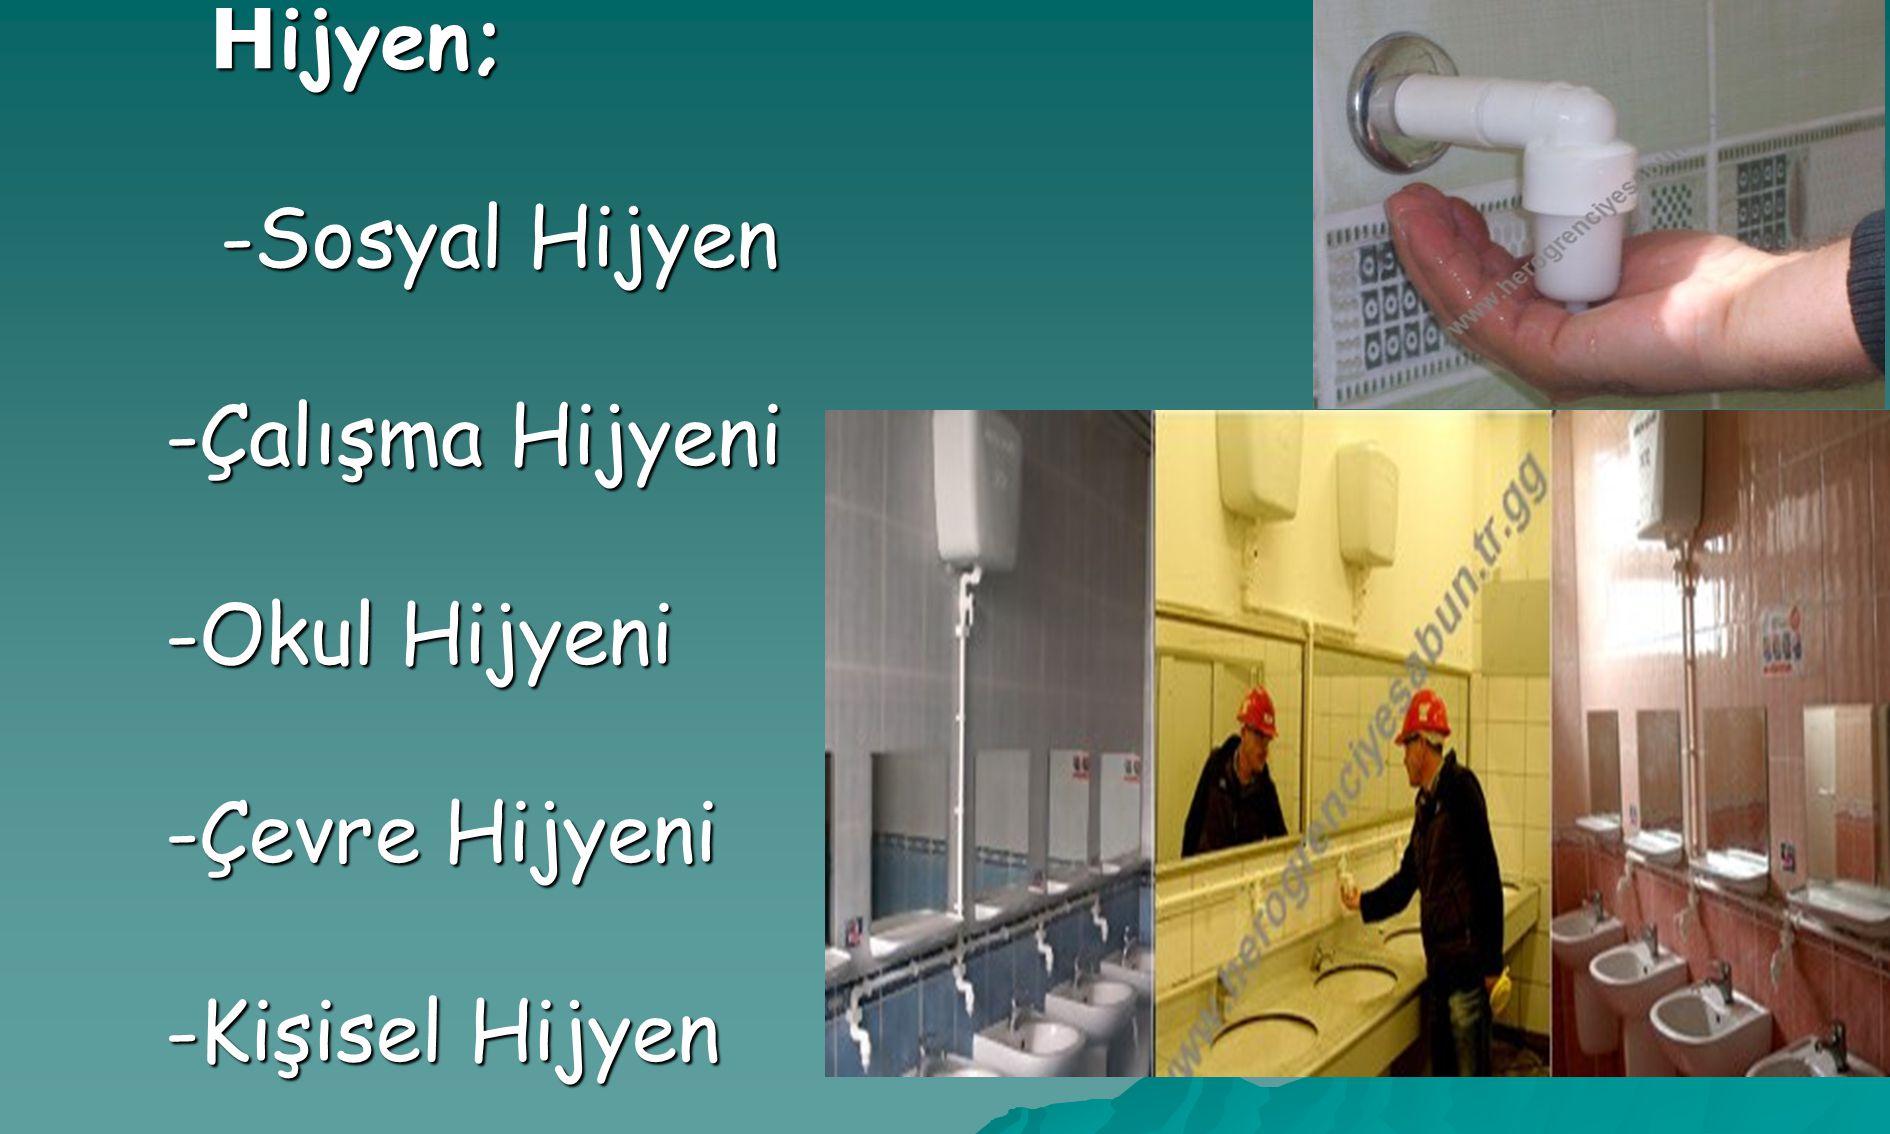 H ijyen; H ijyen; -Sosyal Hijyen -Sosyal Hijyen -Çalışma Hijyeni -Çalışma Hijyeni -Okul Hijyeni -Okul Hijyeni -Çevre Hijyeni -Çevre Hijyeni -Kişisel Hijyen -Kişisel Hijyen